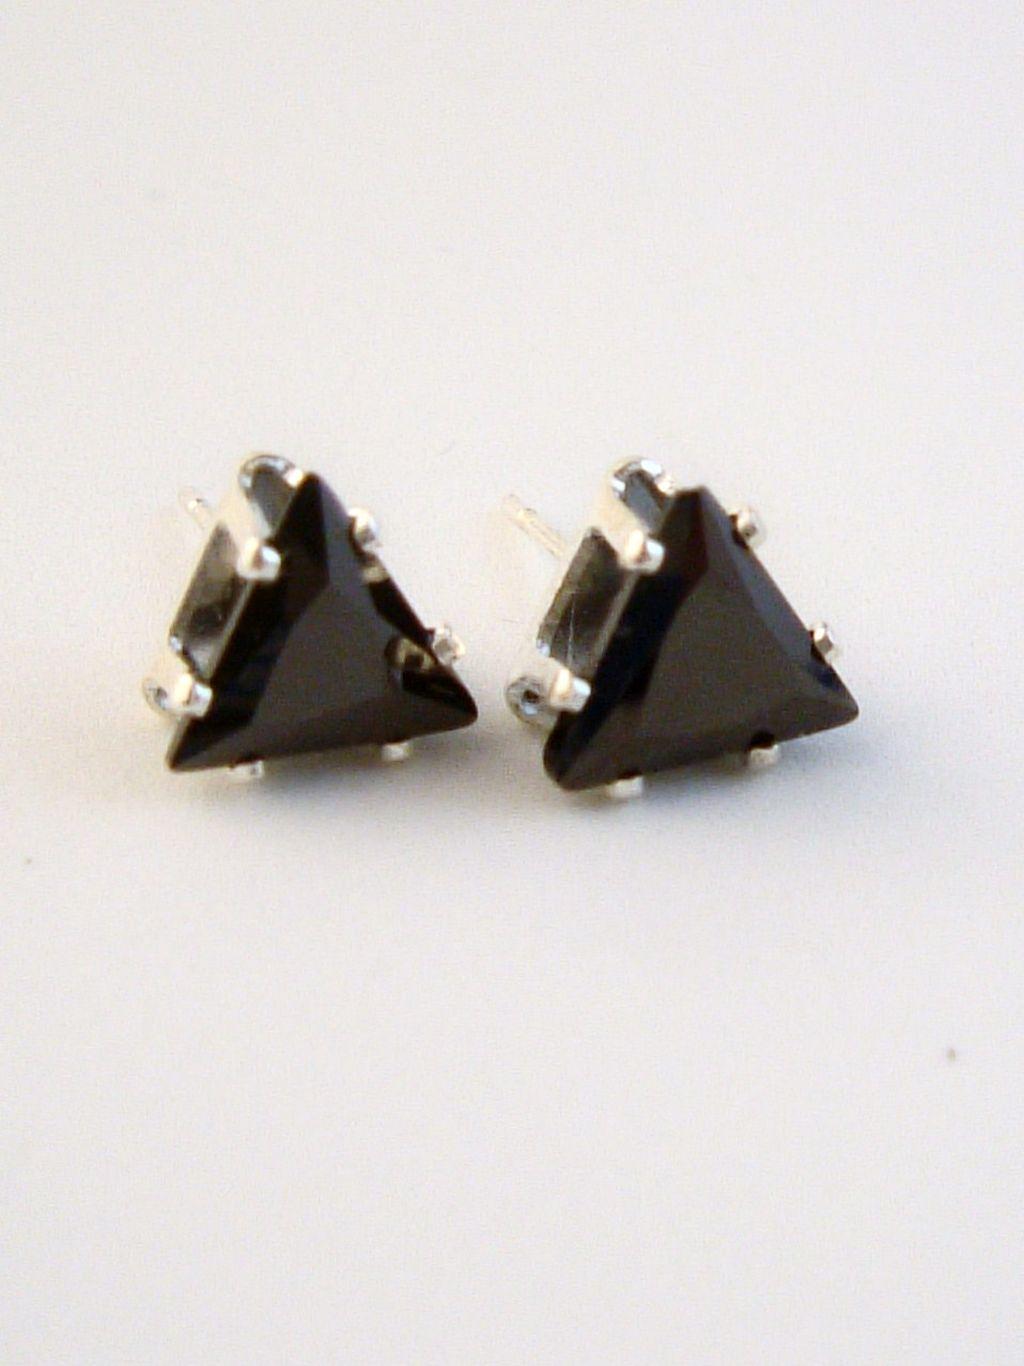 Black Diamond Triangle Cut Silver Stud Earrings Genuine Cz